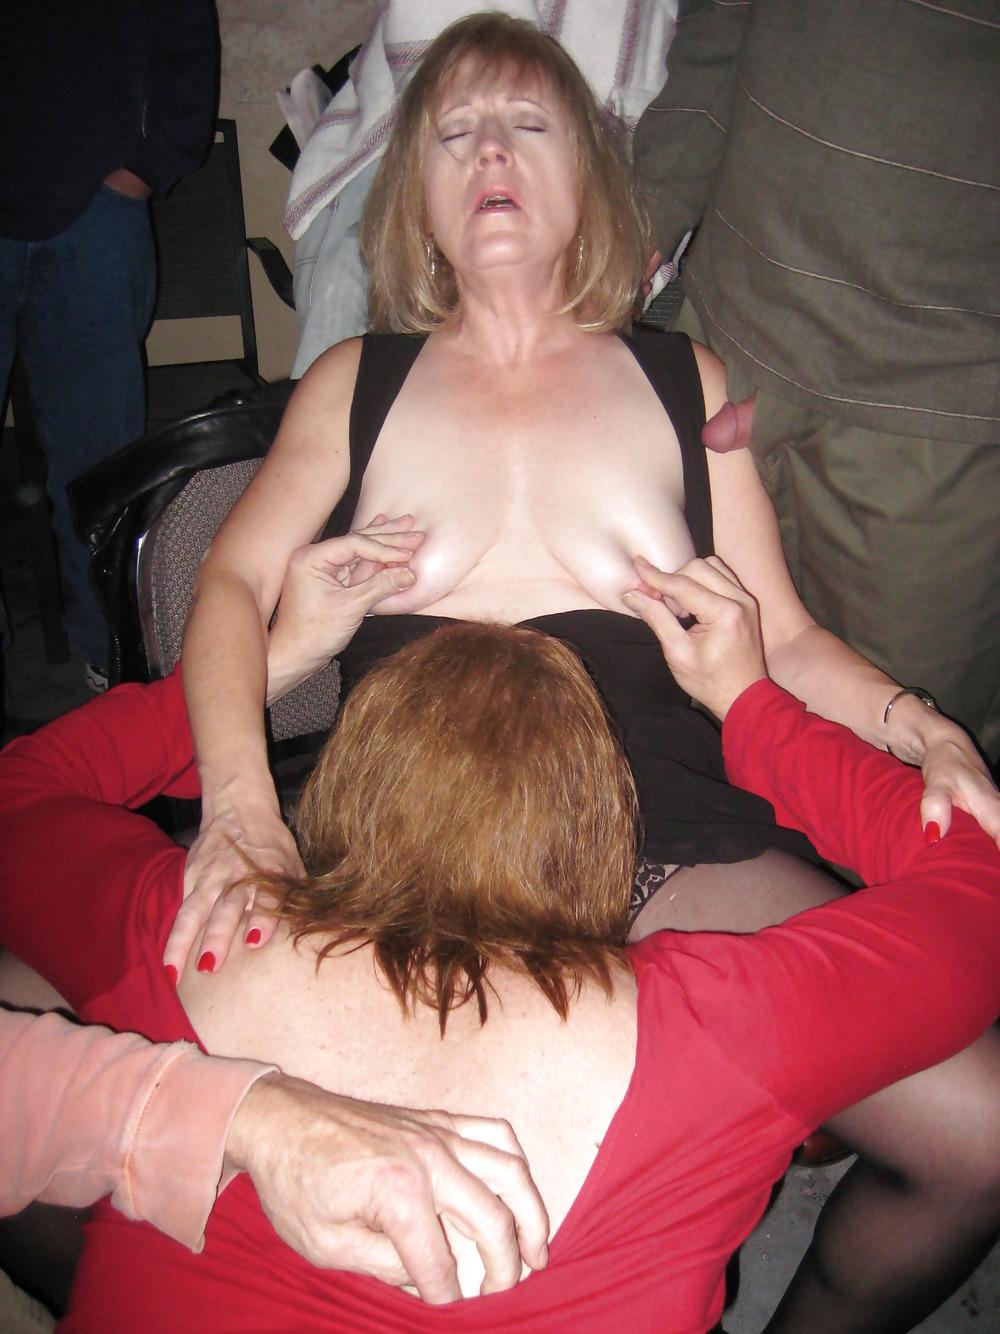 Grannies matures milf housewives amateurs 50 #13664300